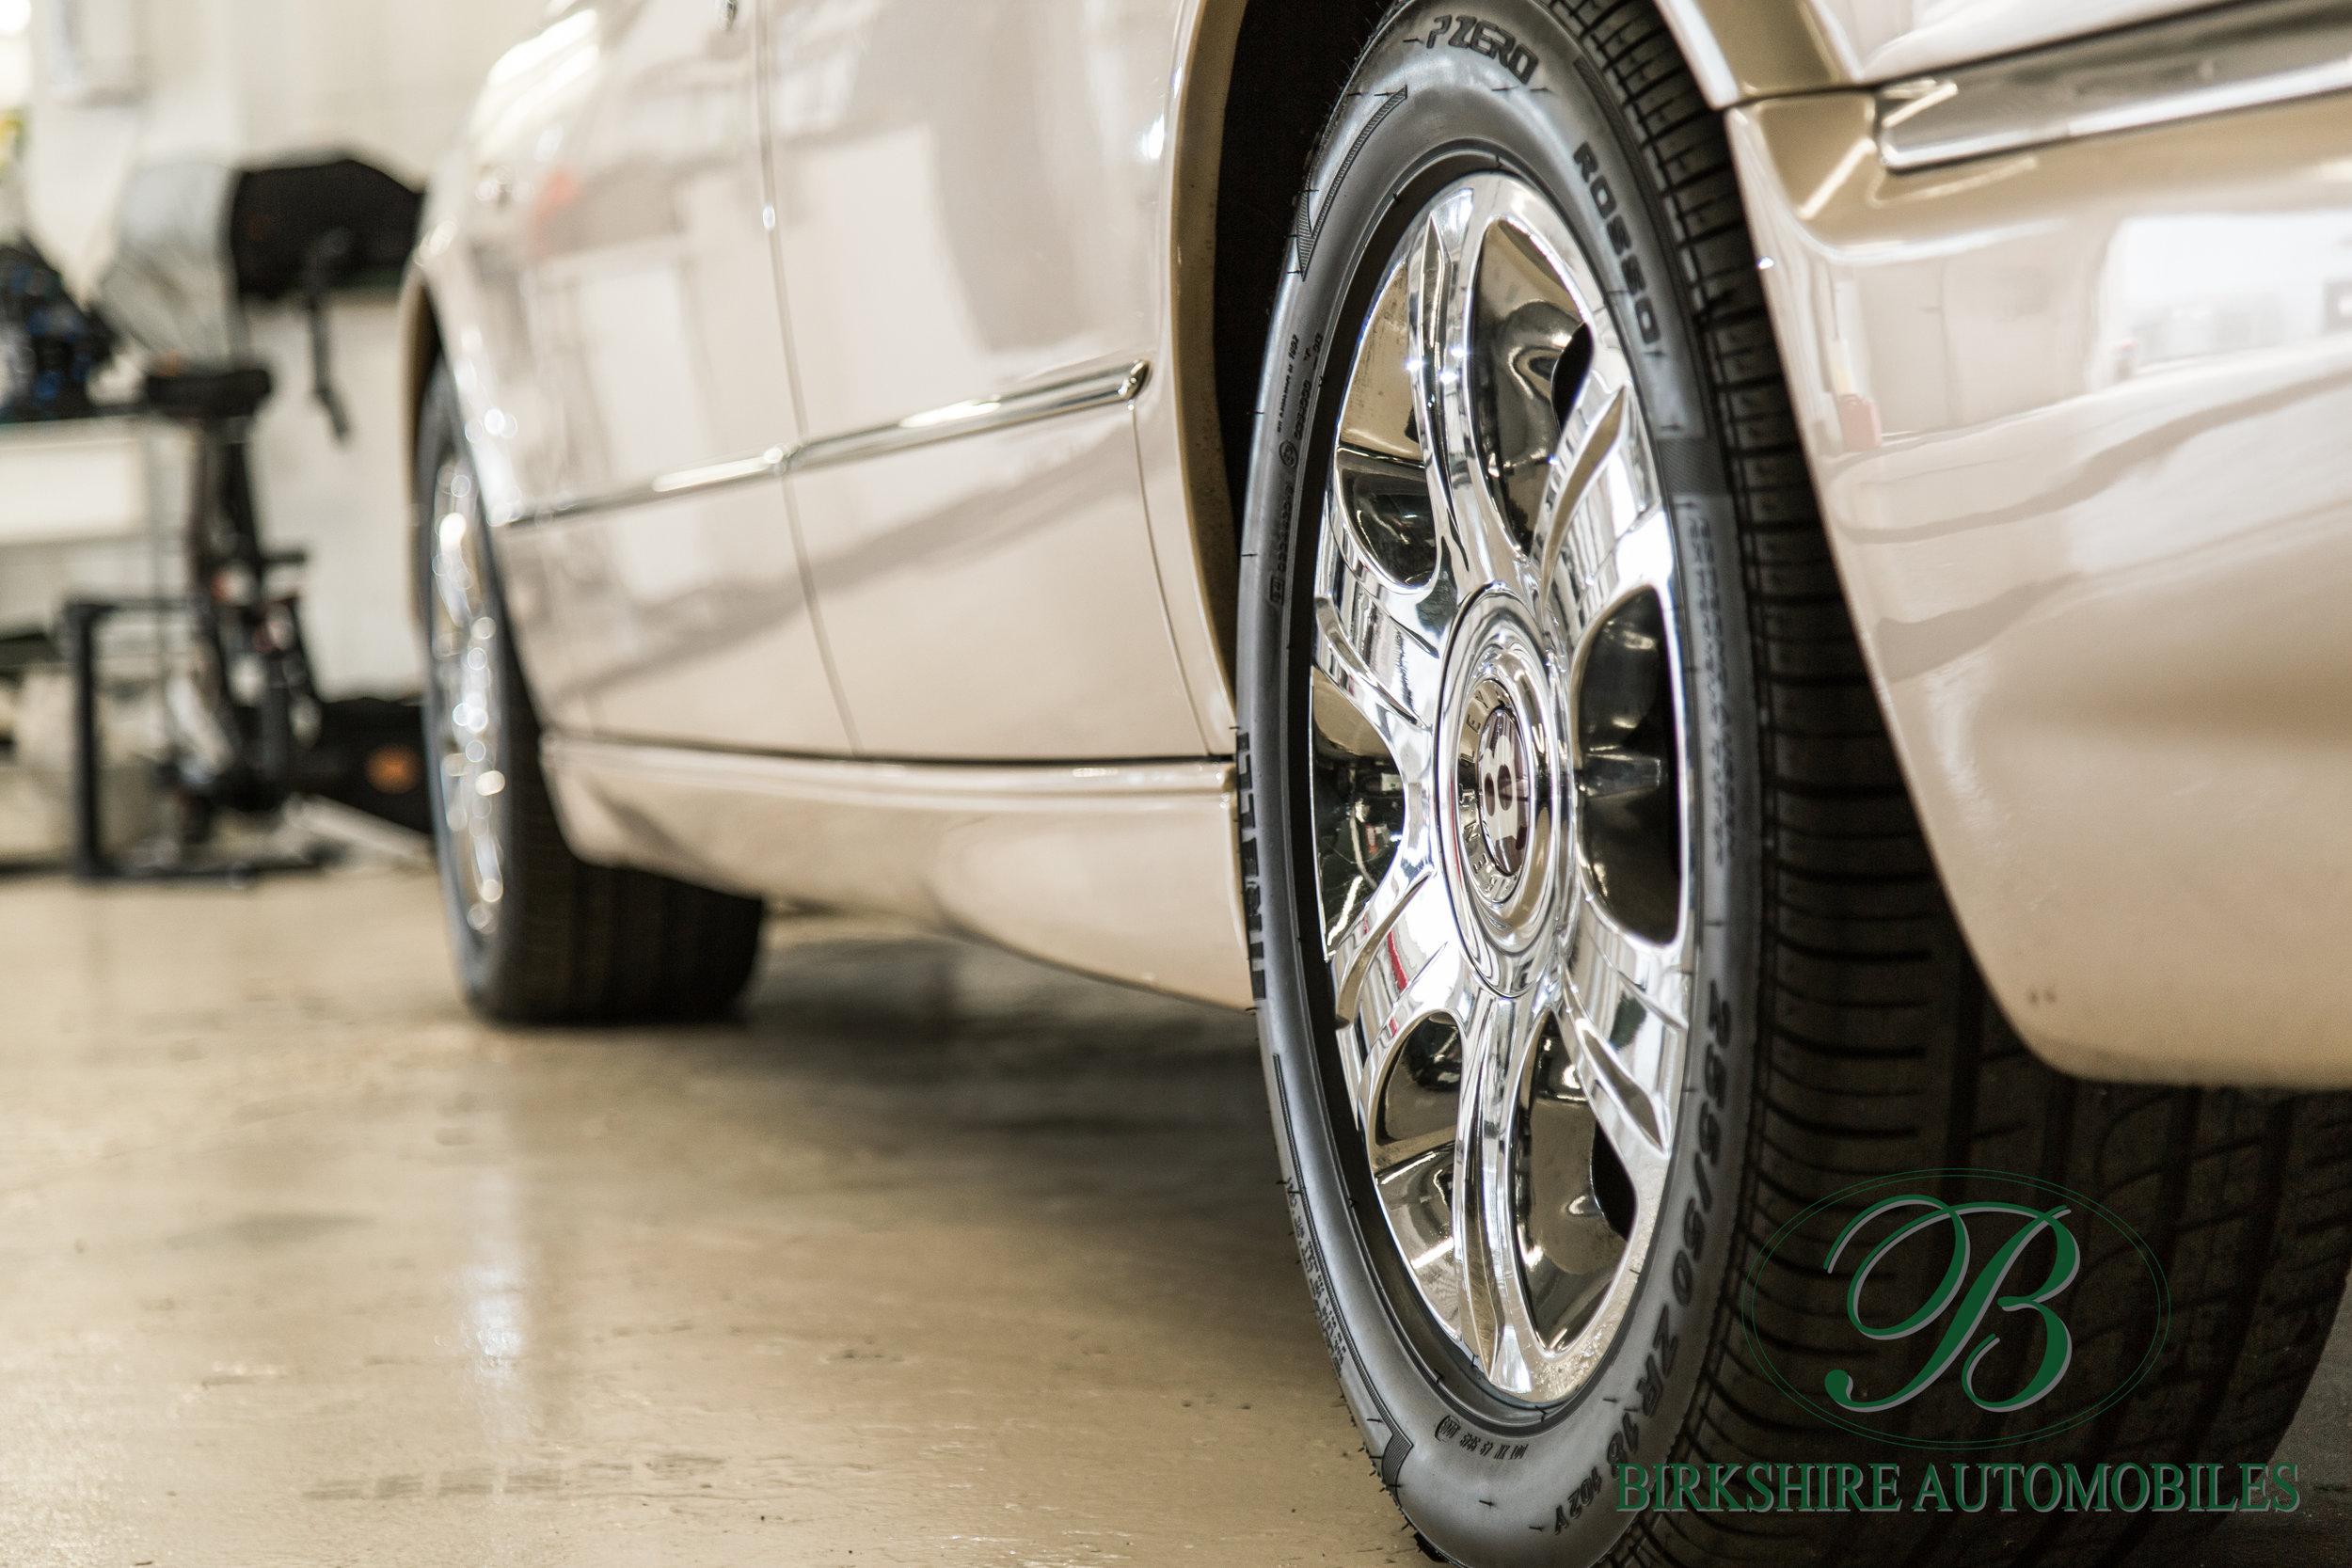 Birkshire Automobiles-342.jpg